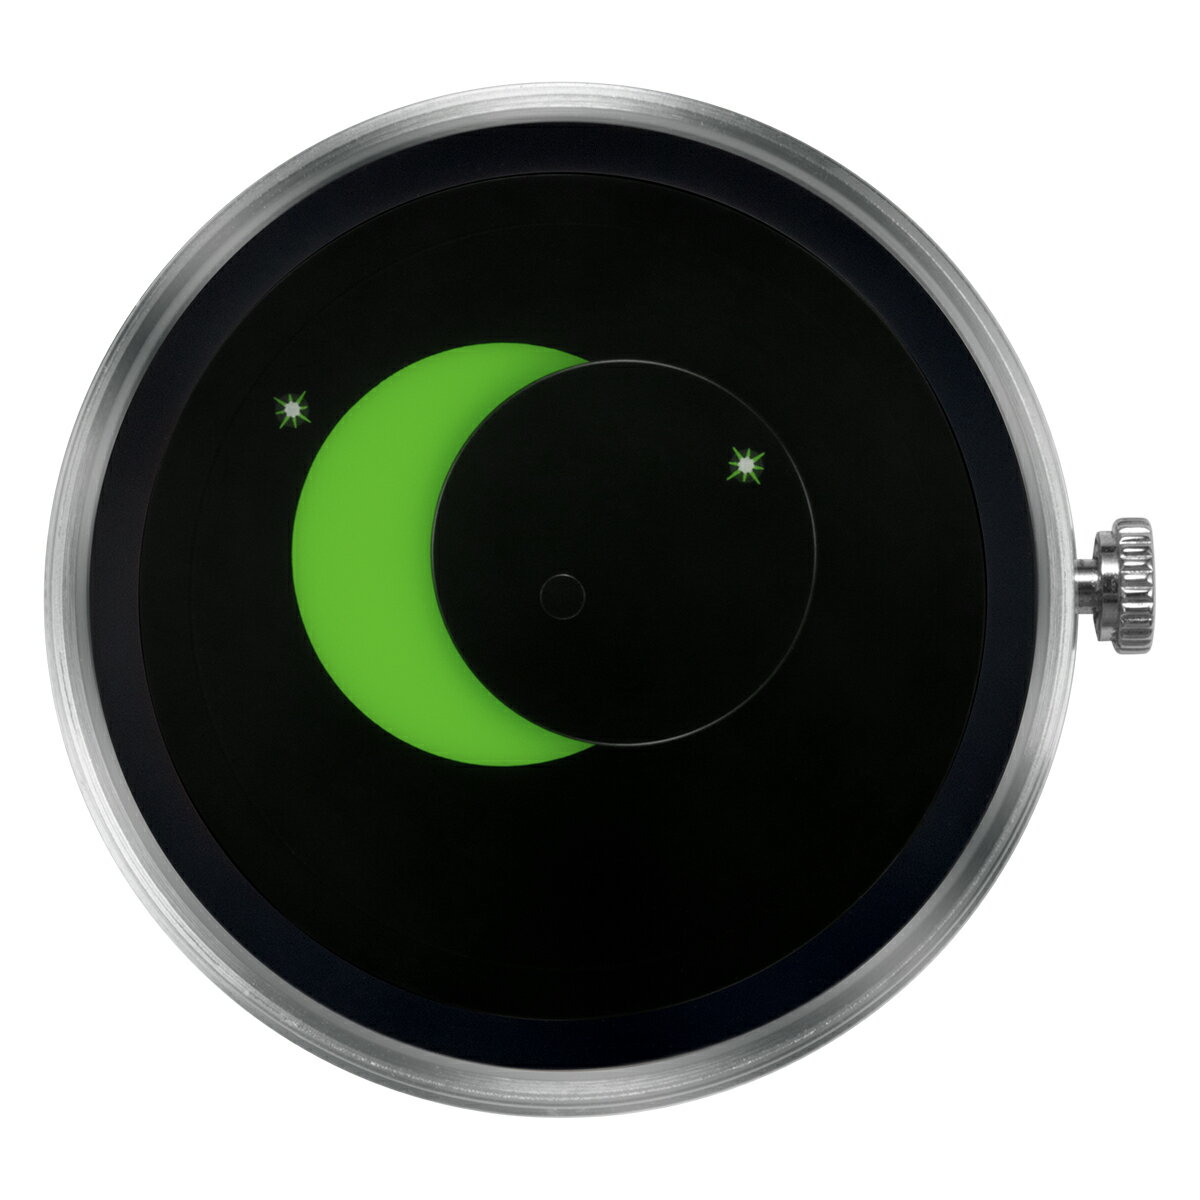 ZEROO 交換用クロックボディ ZEROO SUPER MOON ゼロ 電池式クォーツ 腕時計 [M02008]